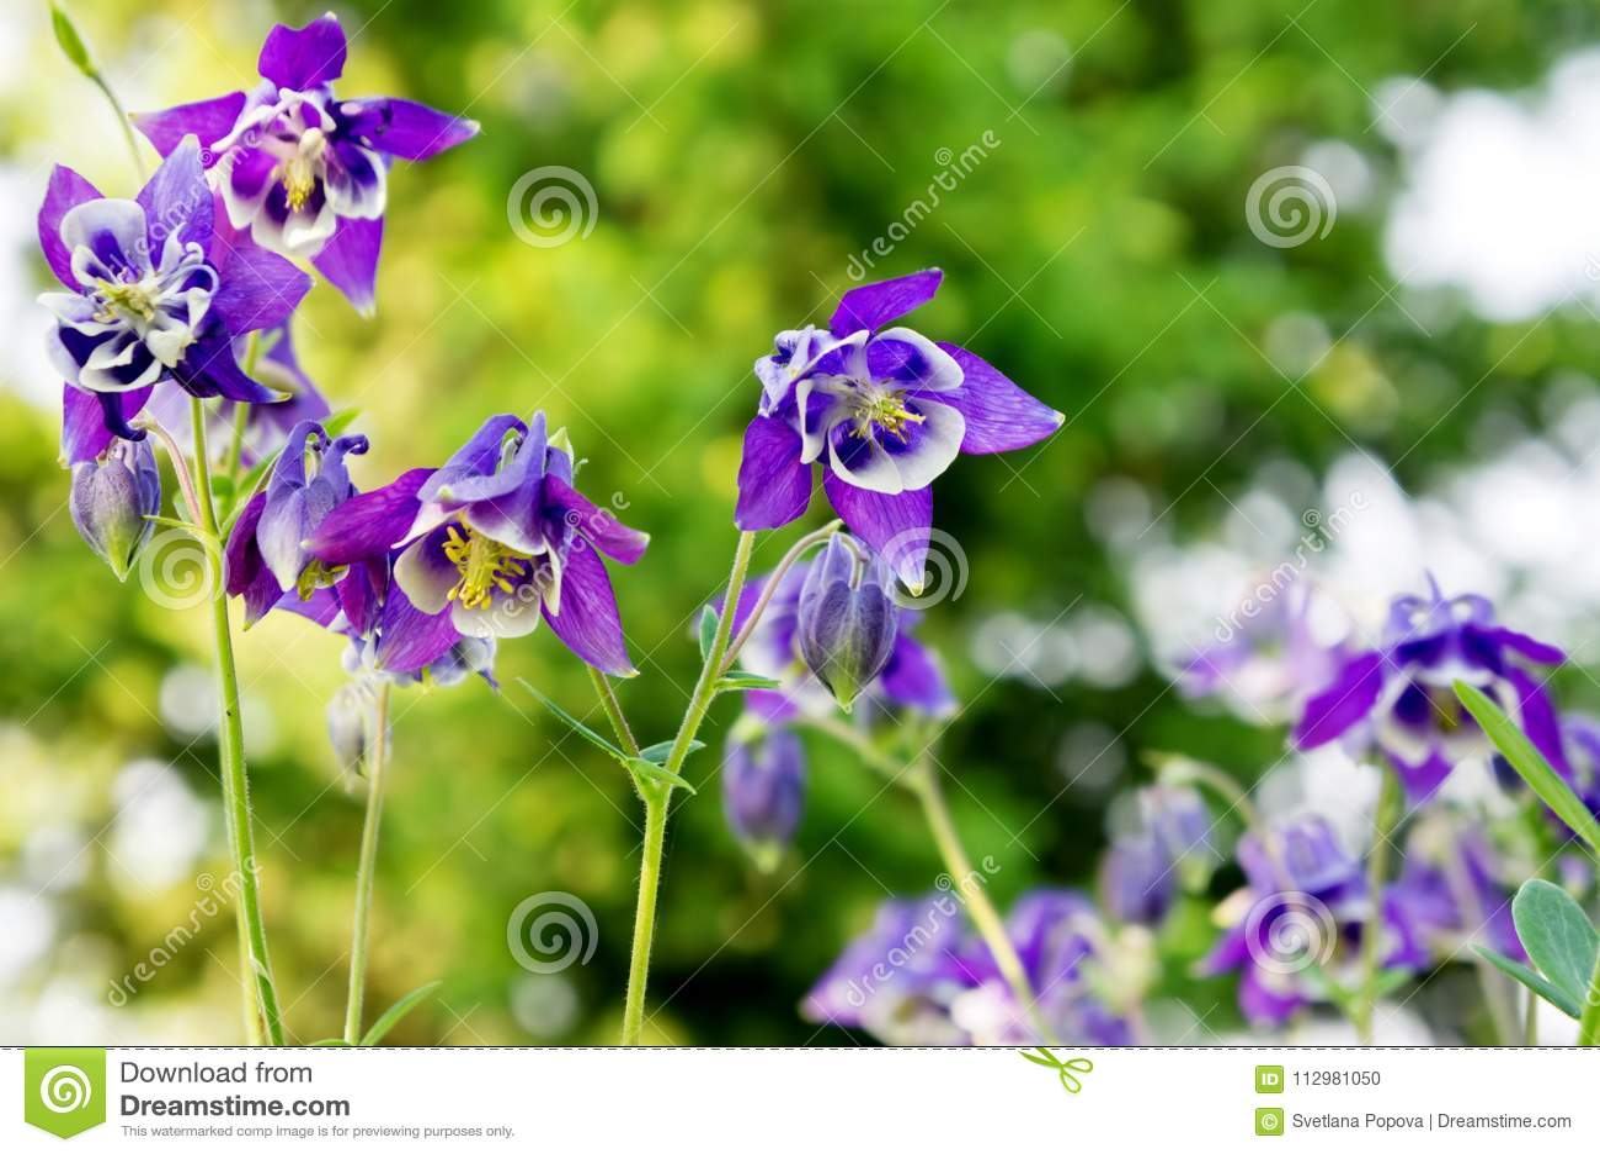 Flowers blue aquilegia Aquilegia vulgaris in a garden on a bright green background.